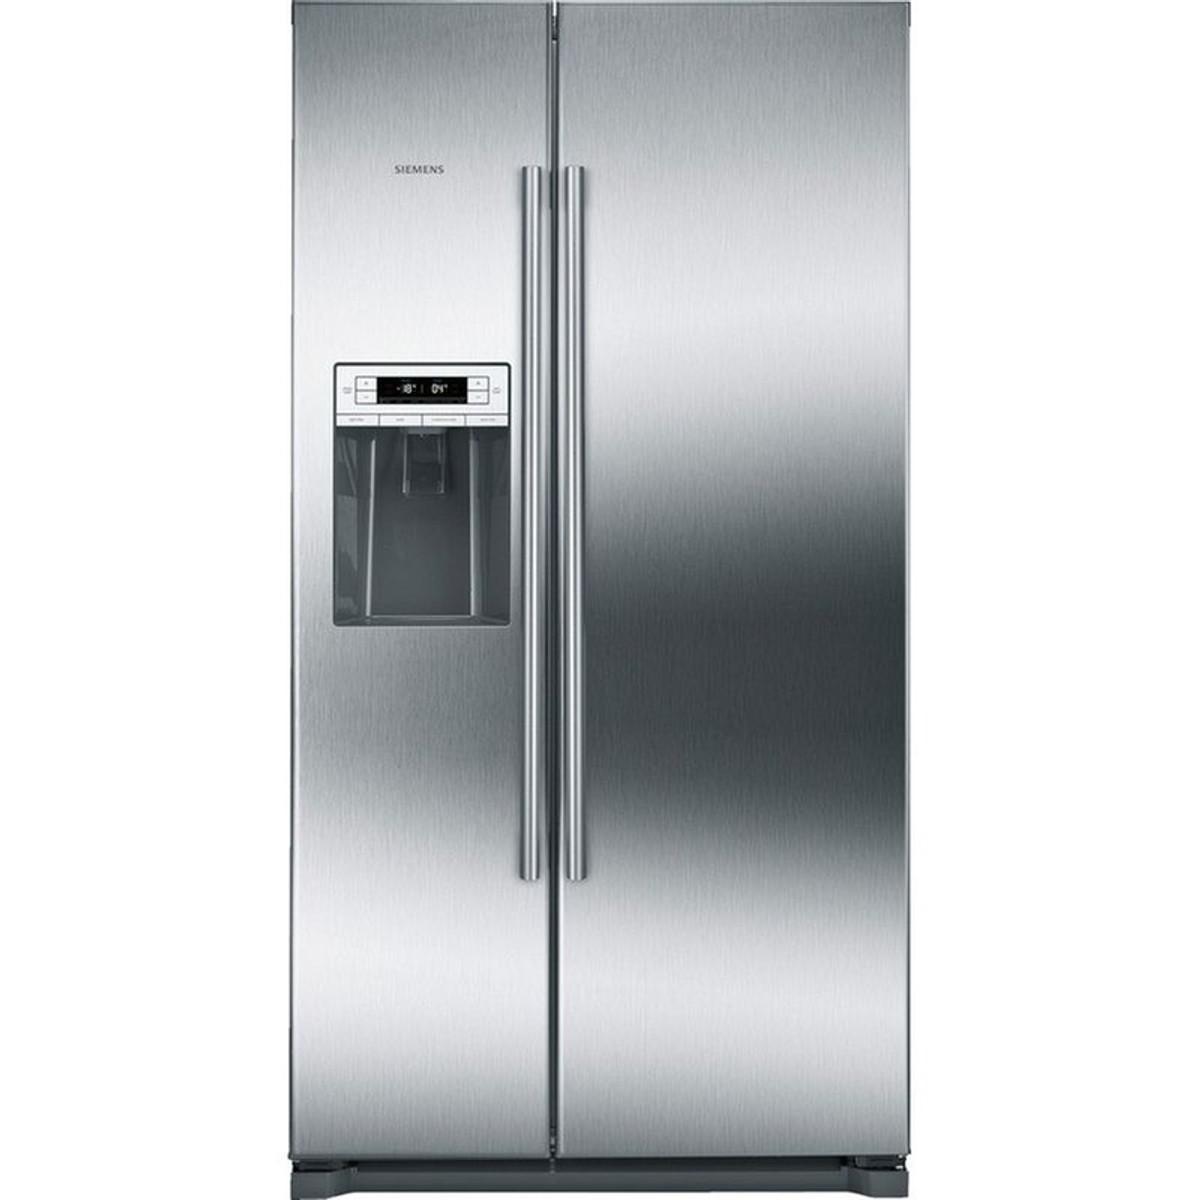 Refrigerateur Americain Ka90dvi20 Refrigerateur Americain Refrigerateur Sous Plan Et Etagere En Verre